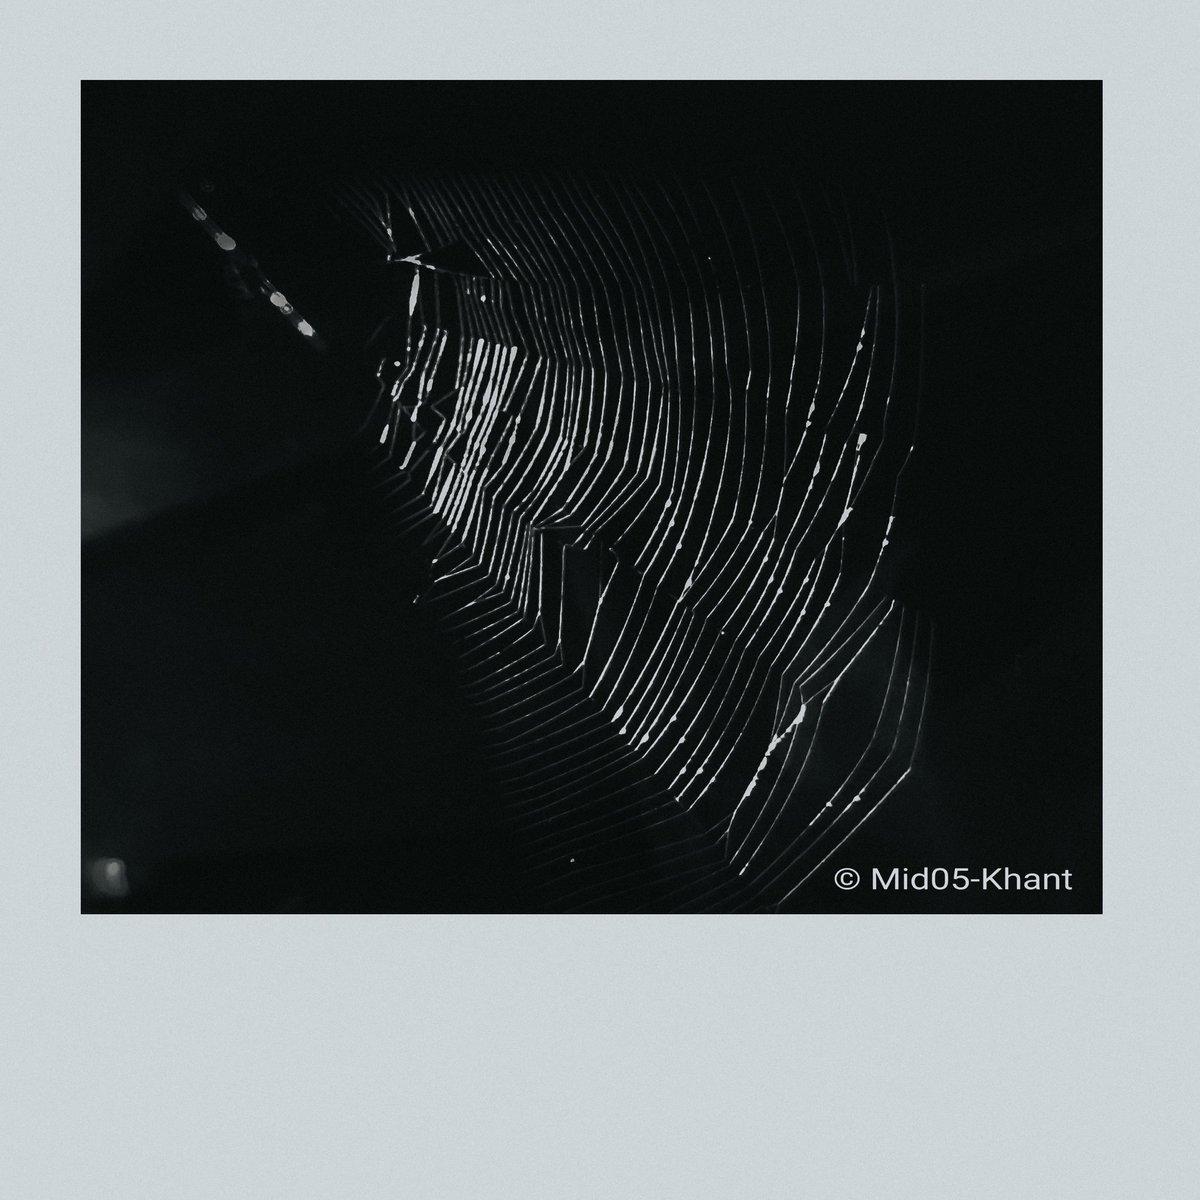 Snare  #spider #blackandwhite  #photography  #mobilephotograph #photographmyanmar